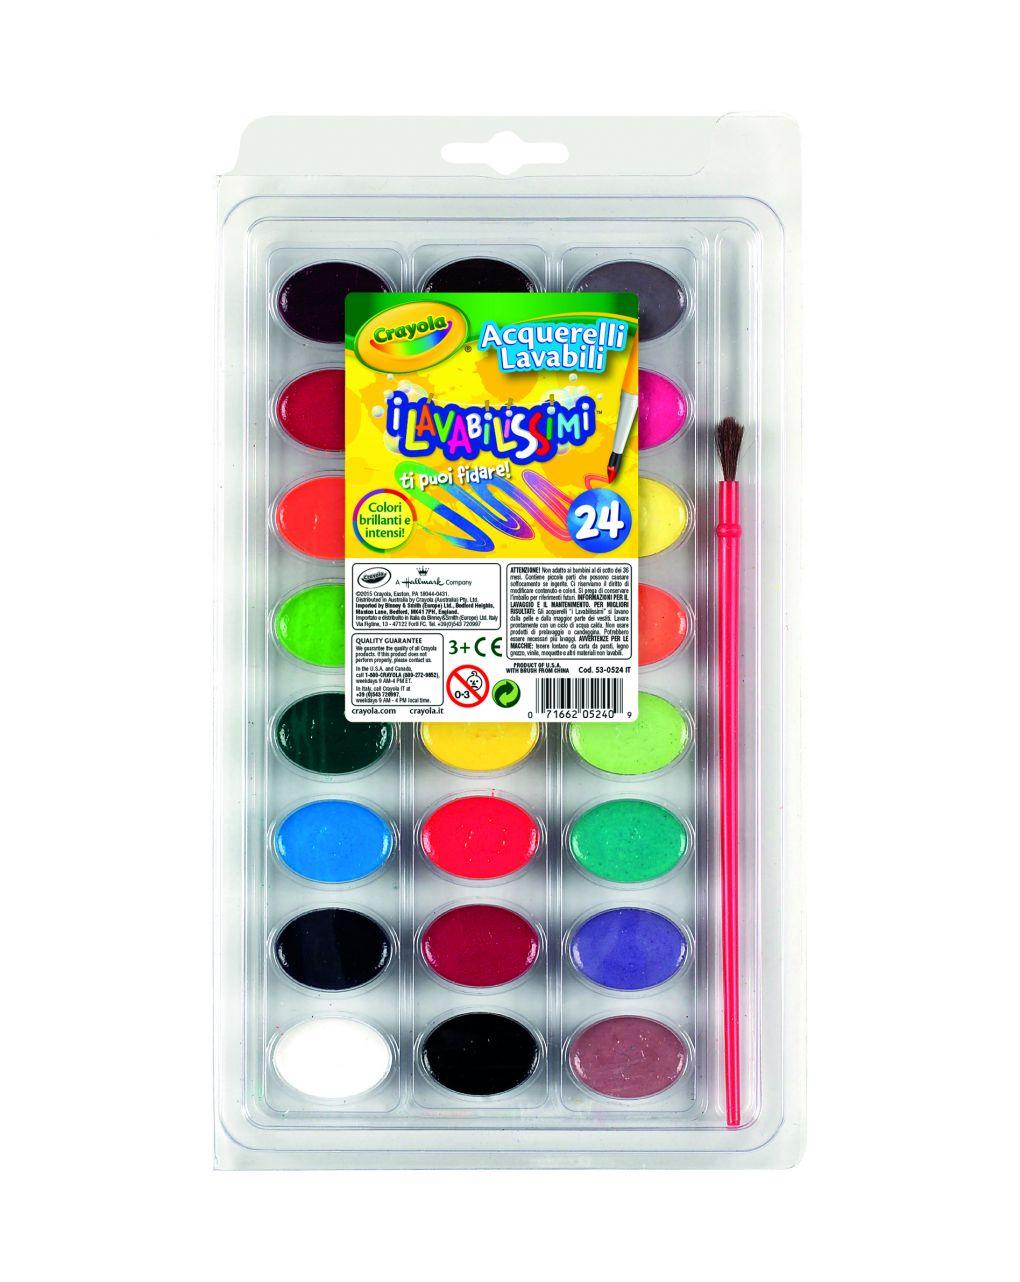 Crayola - 24 acquerelli lavabili - Crayola